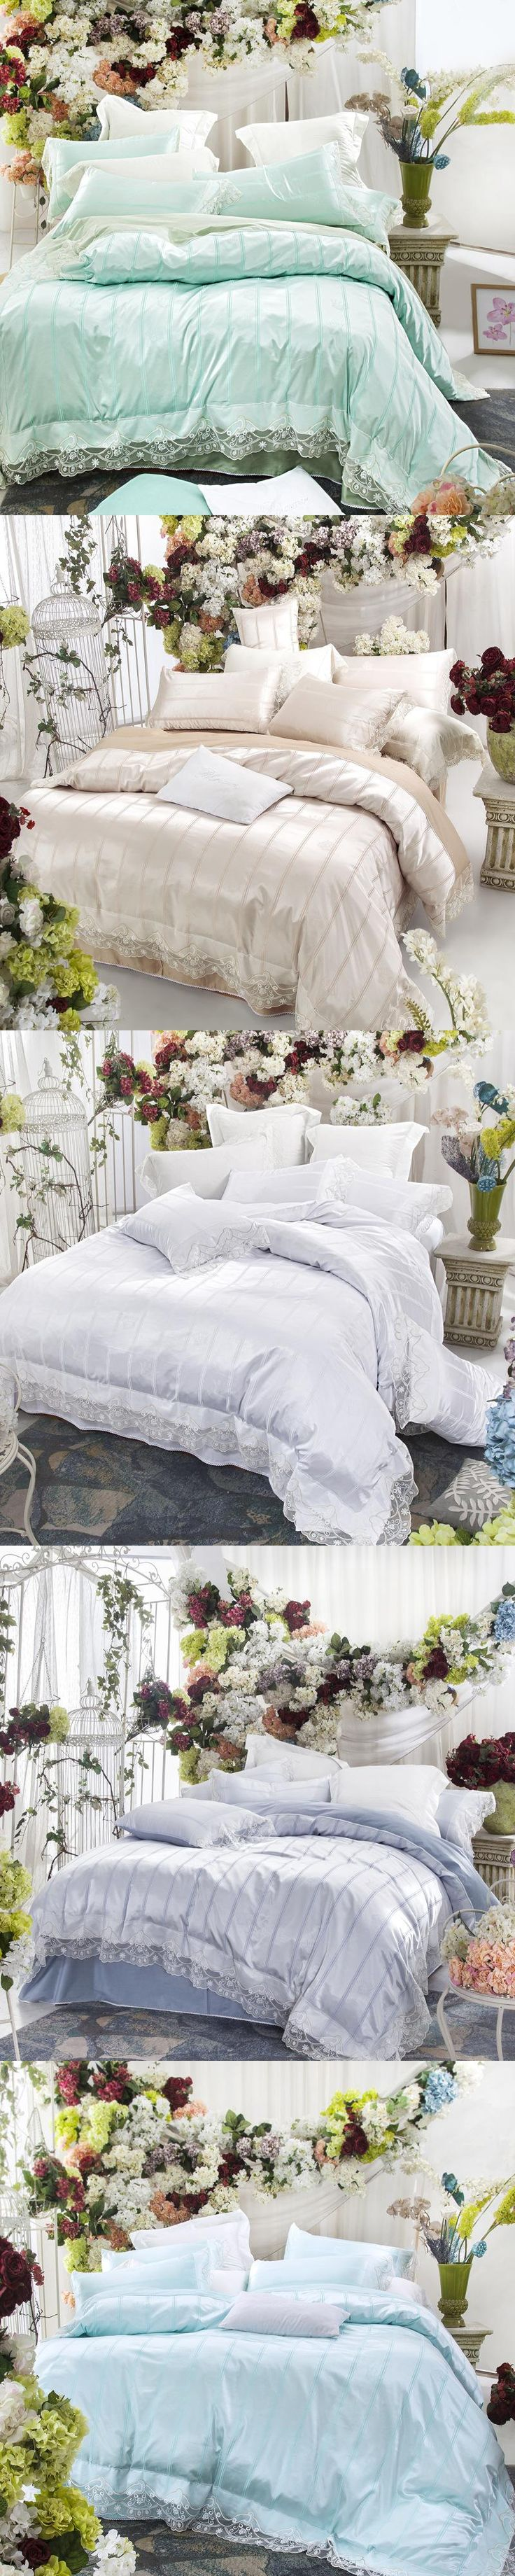 Lace edge satin jacquard Bedding set white blue green princess Bedclothes girls queen king size duvet cover set bed linen